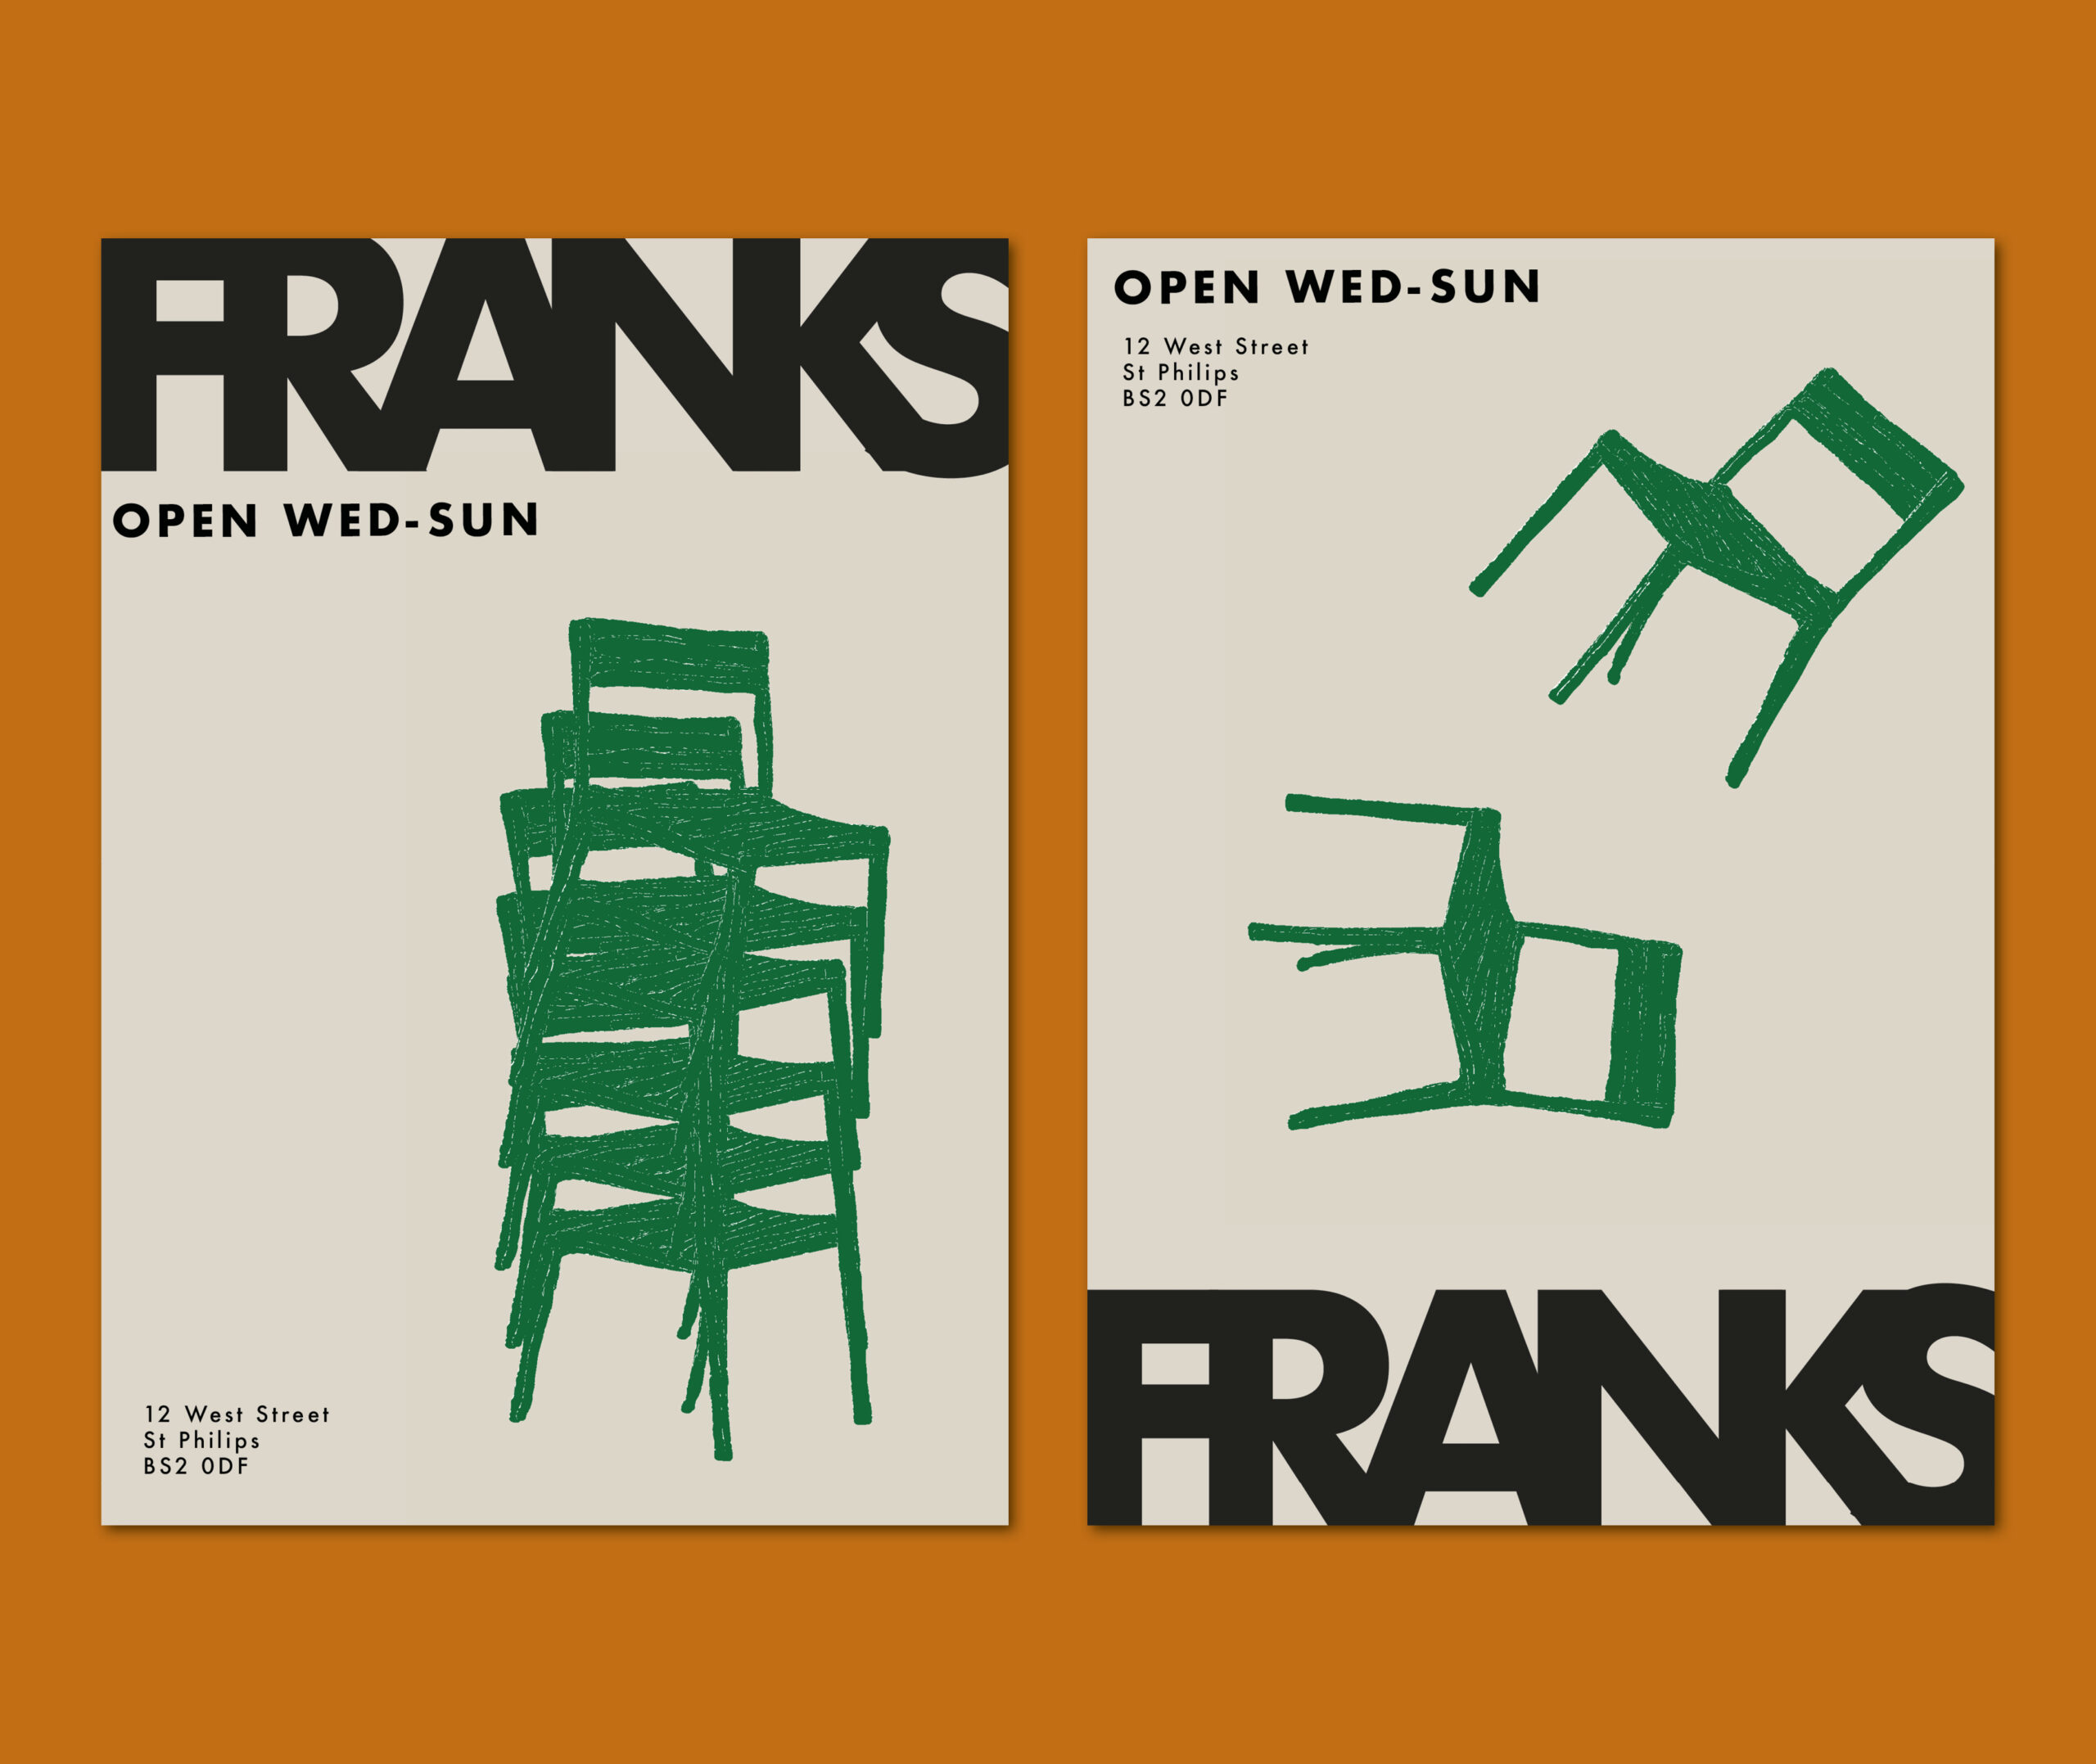 FRANKS-INSTA